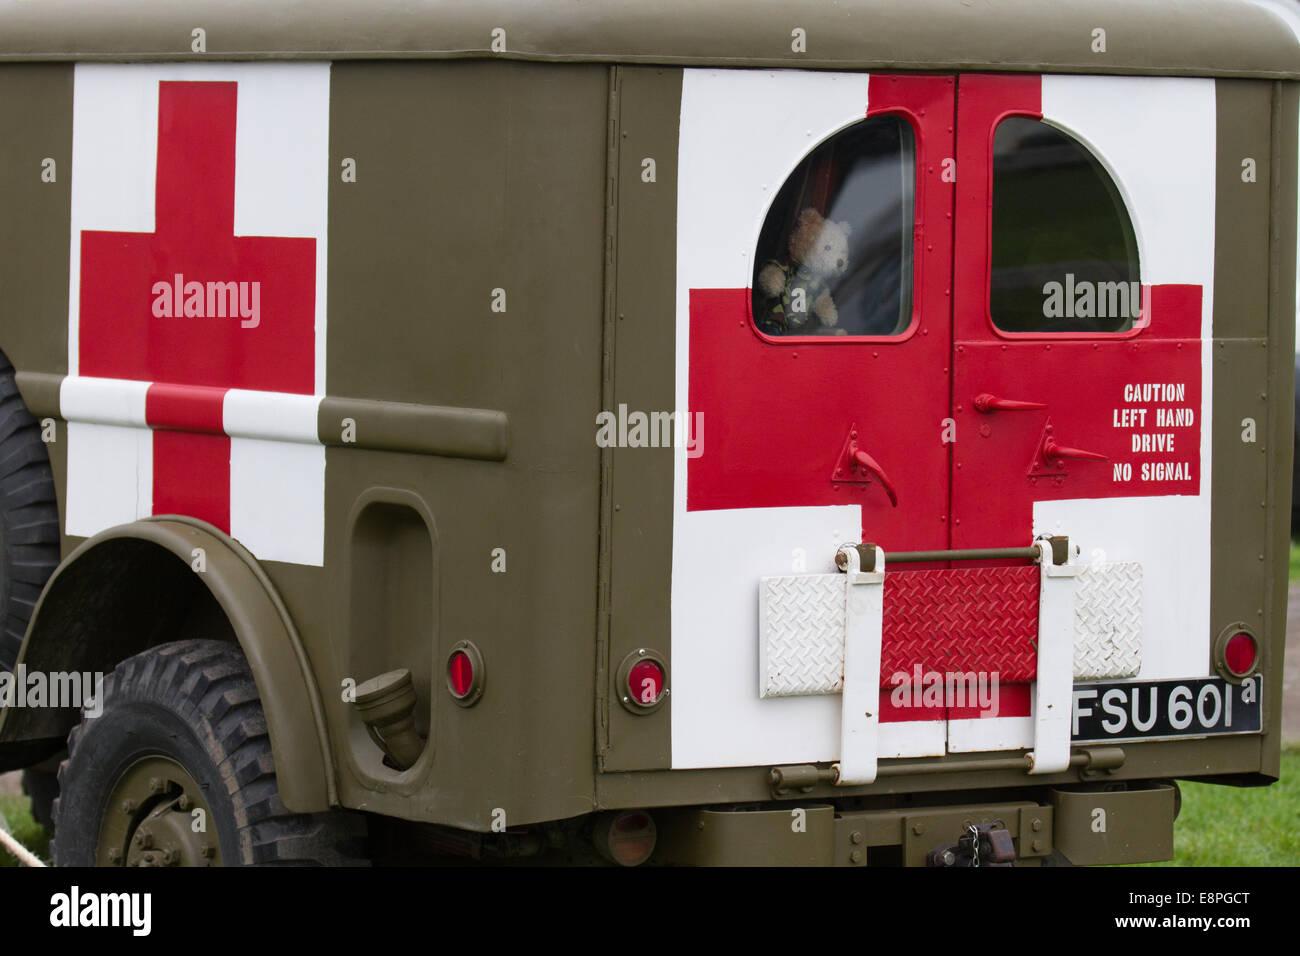 wartime emergency stock photos wartime emergency stock images fsu 601 1942 1945 dodge wc 54 ambulance american medical vintage medic truck